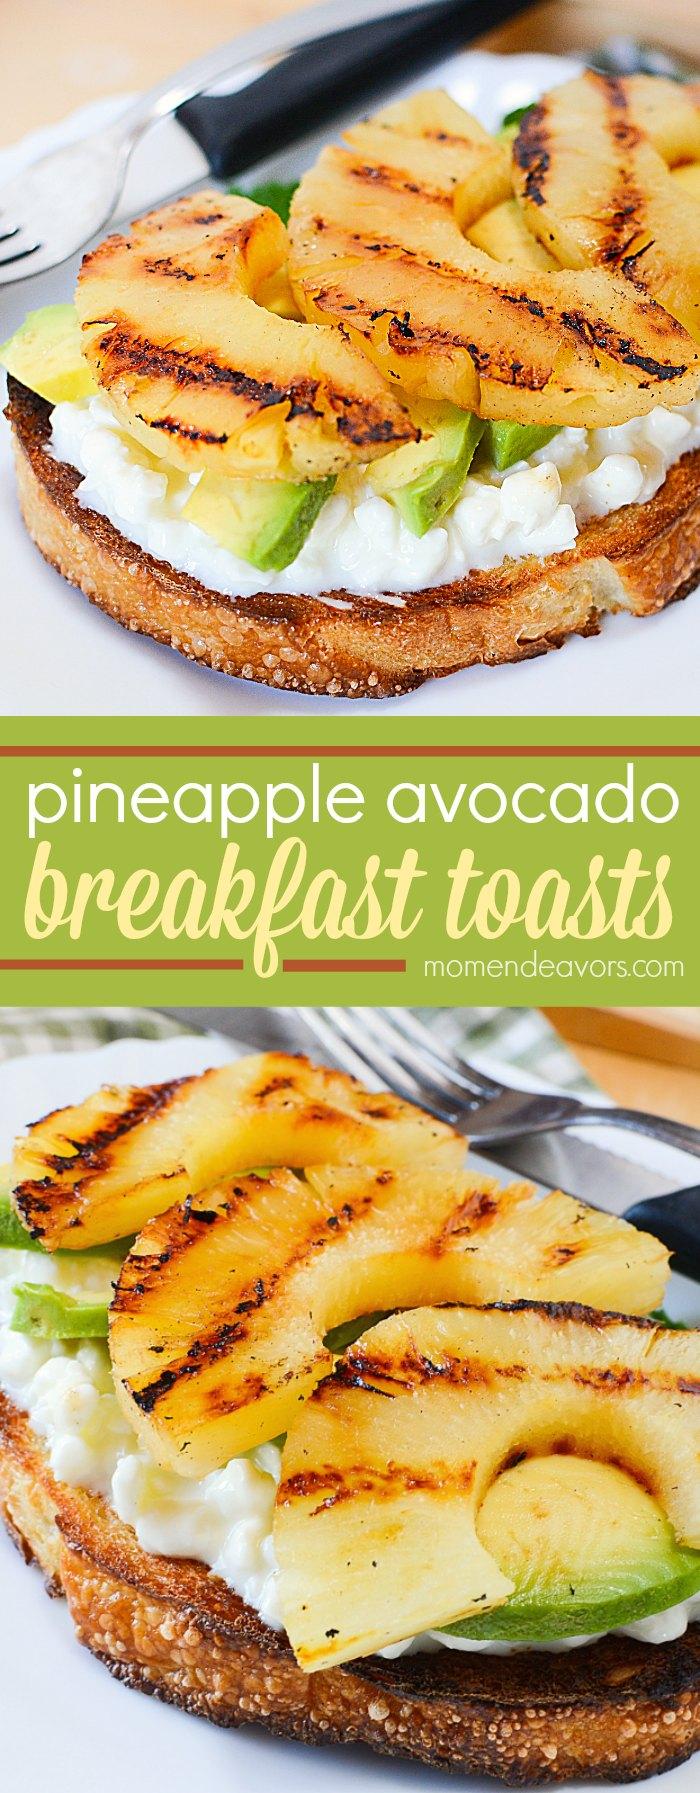 pineapple avocado breakfast toast breakfast recipe